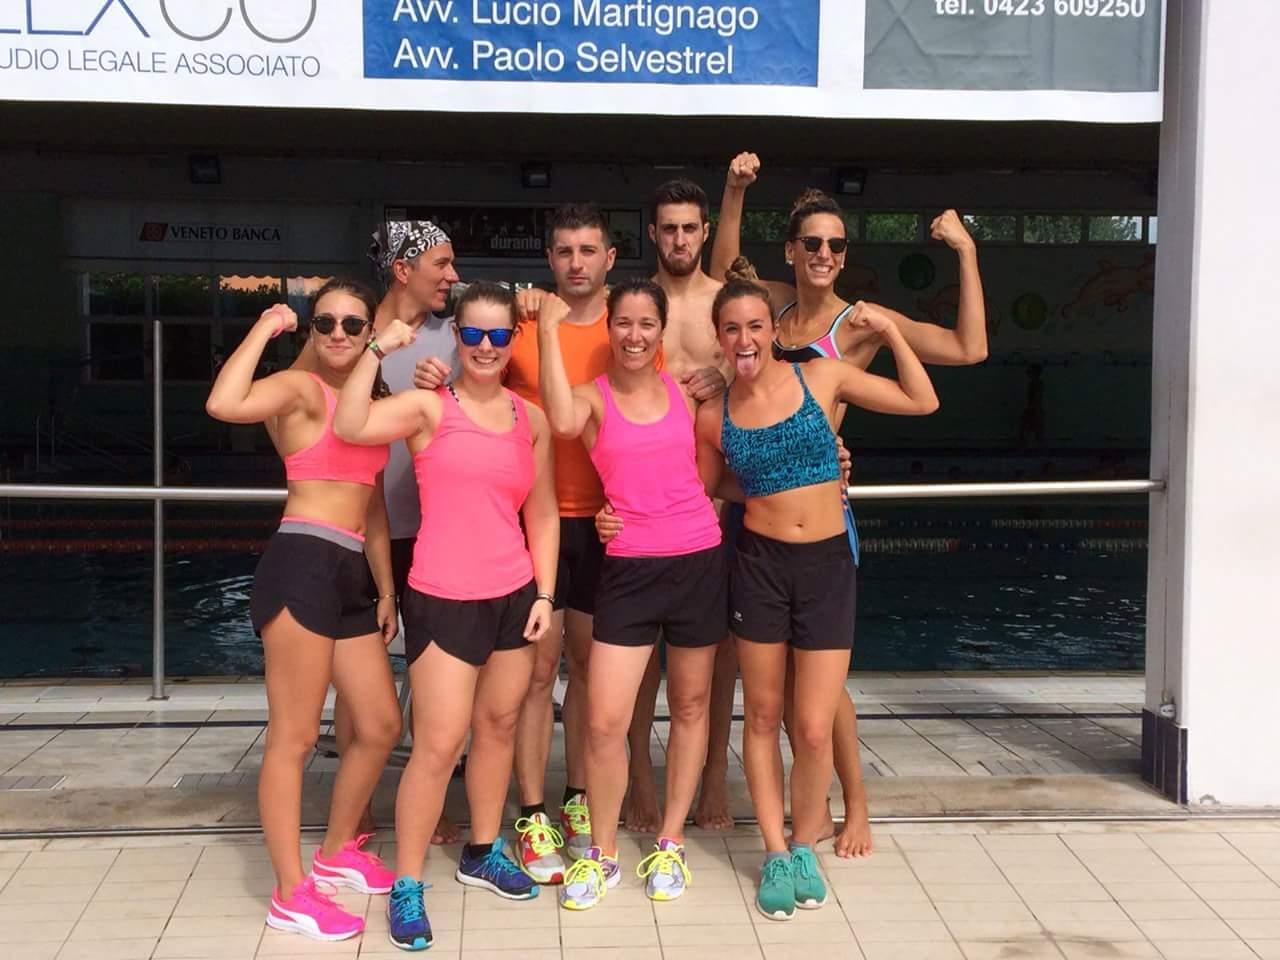 gym piscina montebelluna